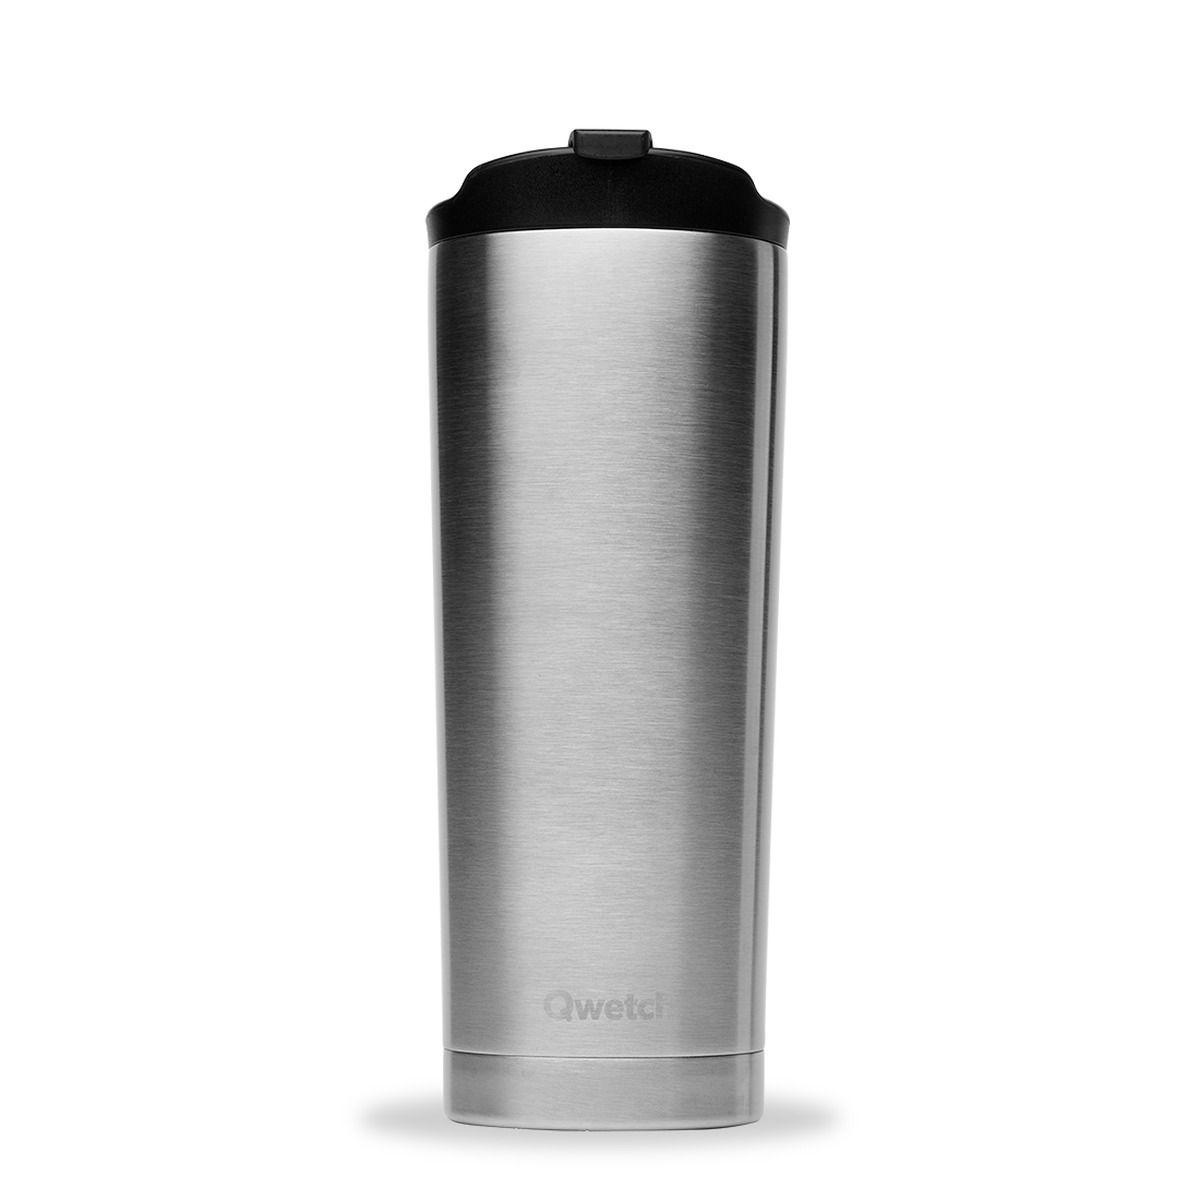 Travel mug  inox brossé 470ml - Qwetch